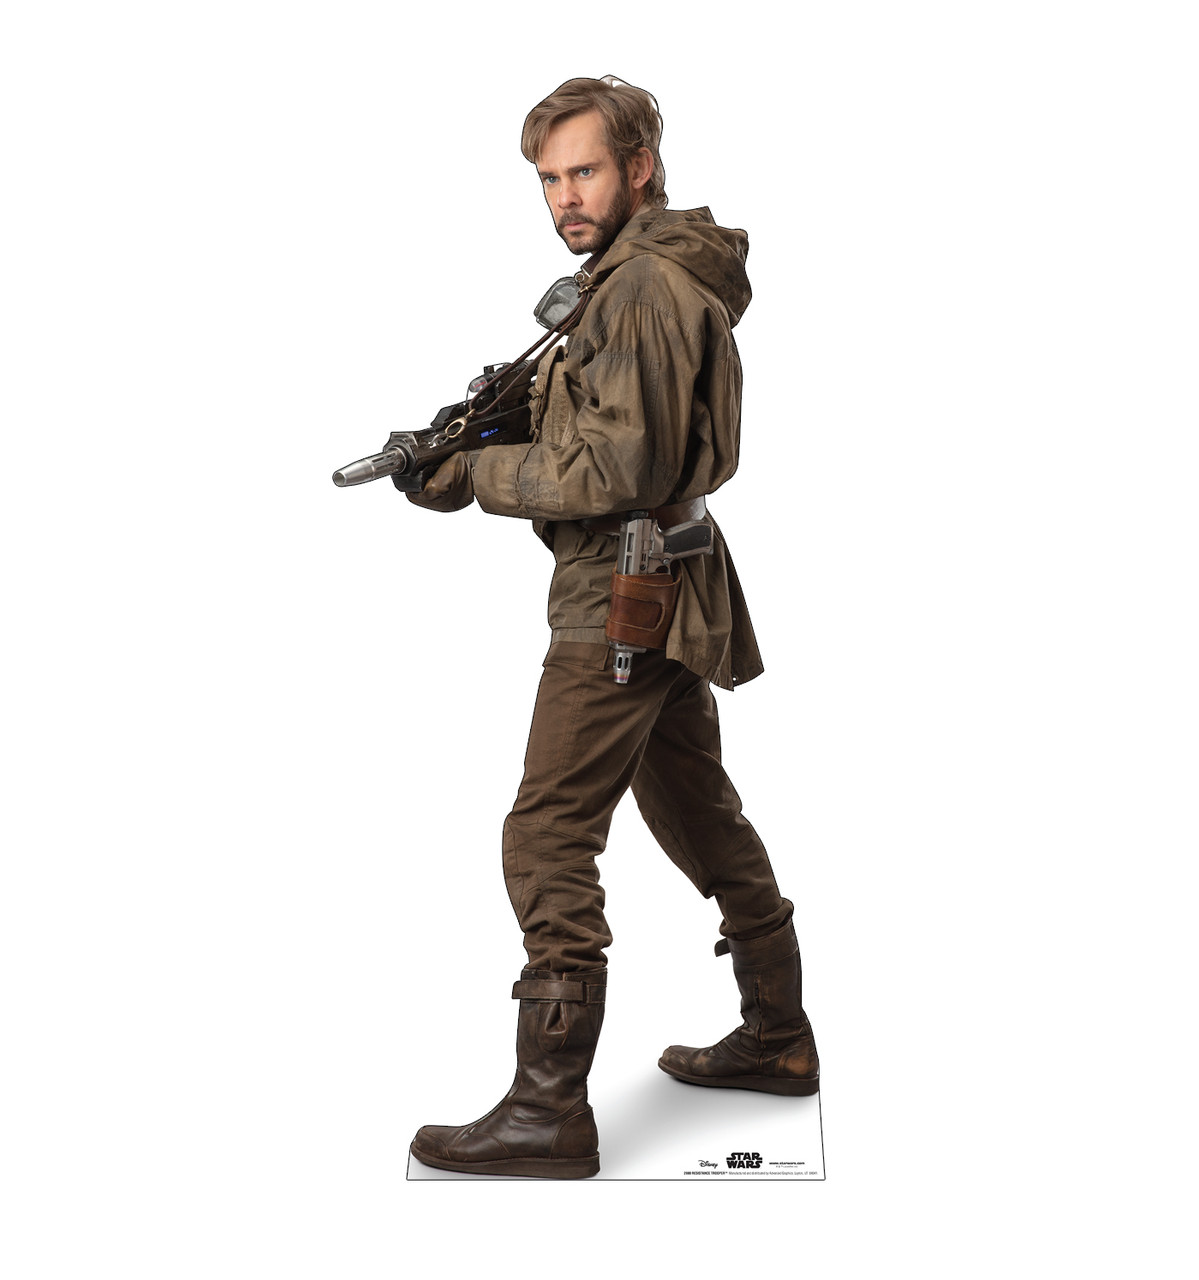 Life-size cardboard standee of Resistance Trooper™ (Star Wars IX).